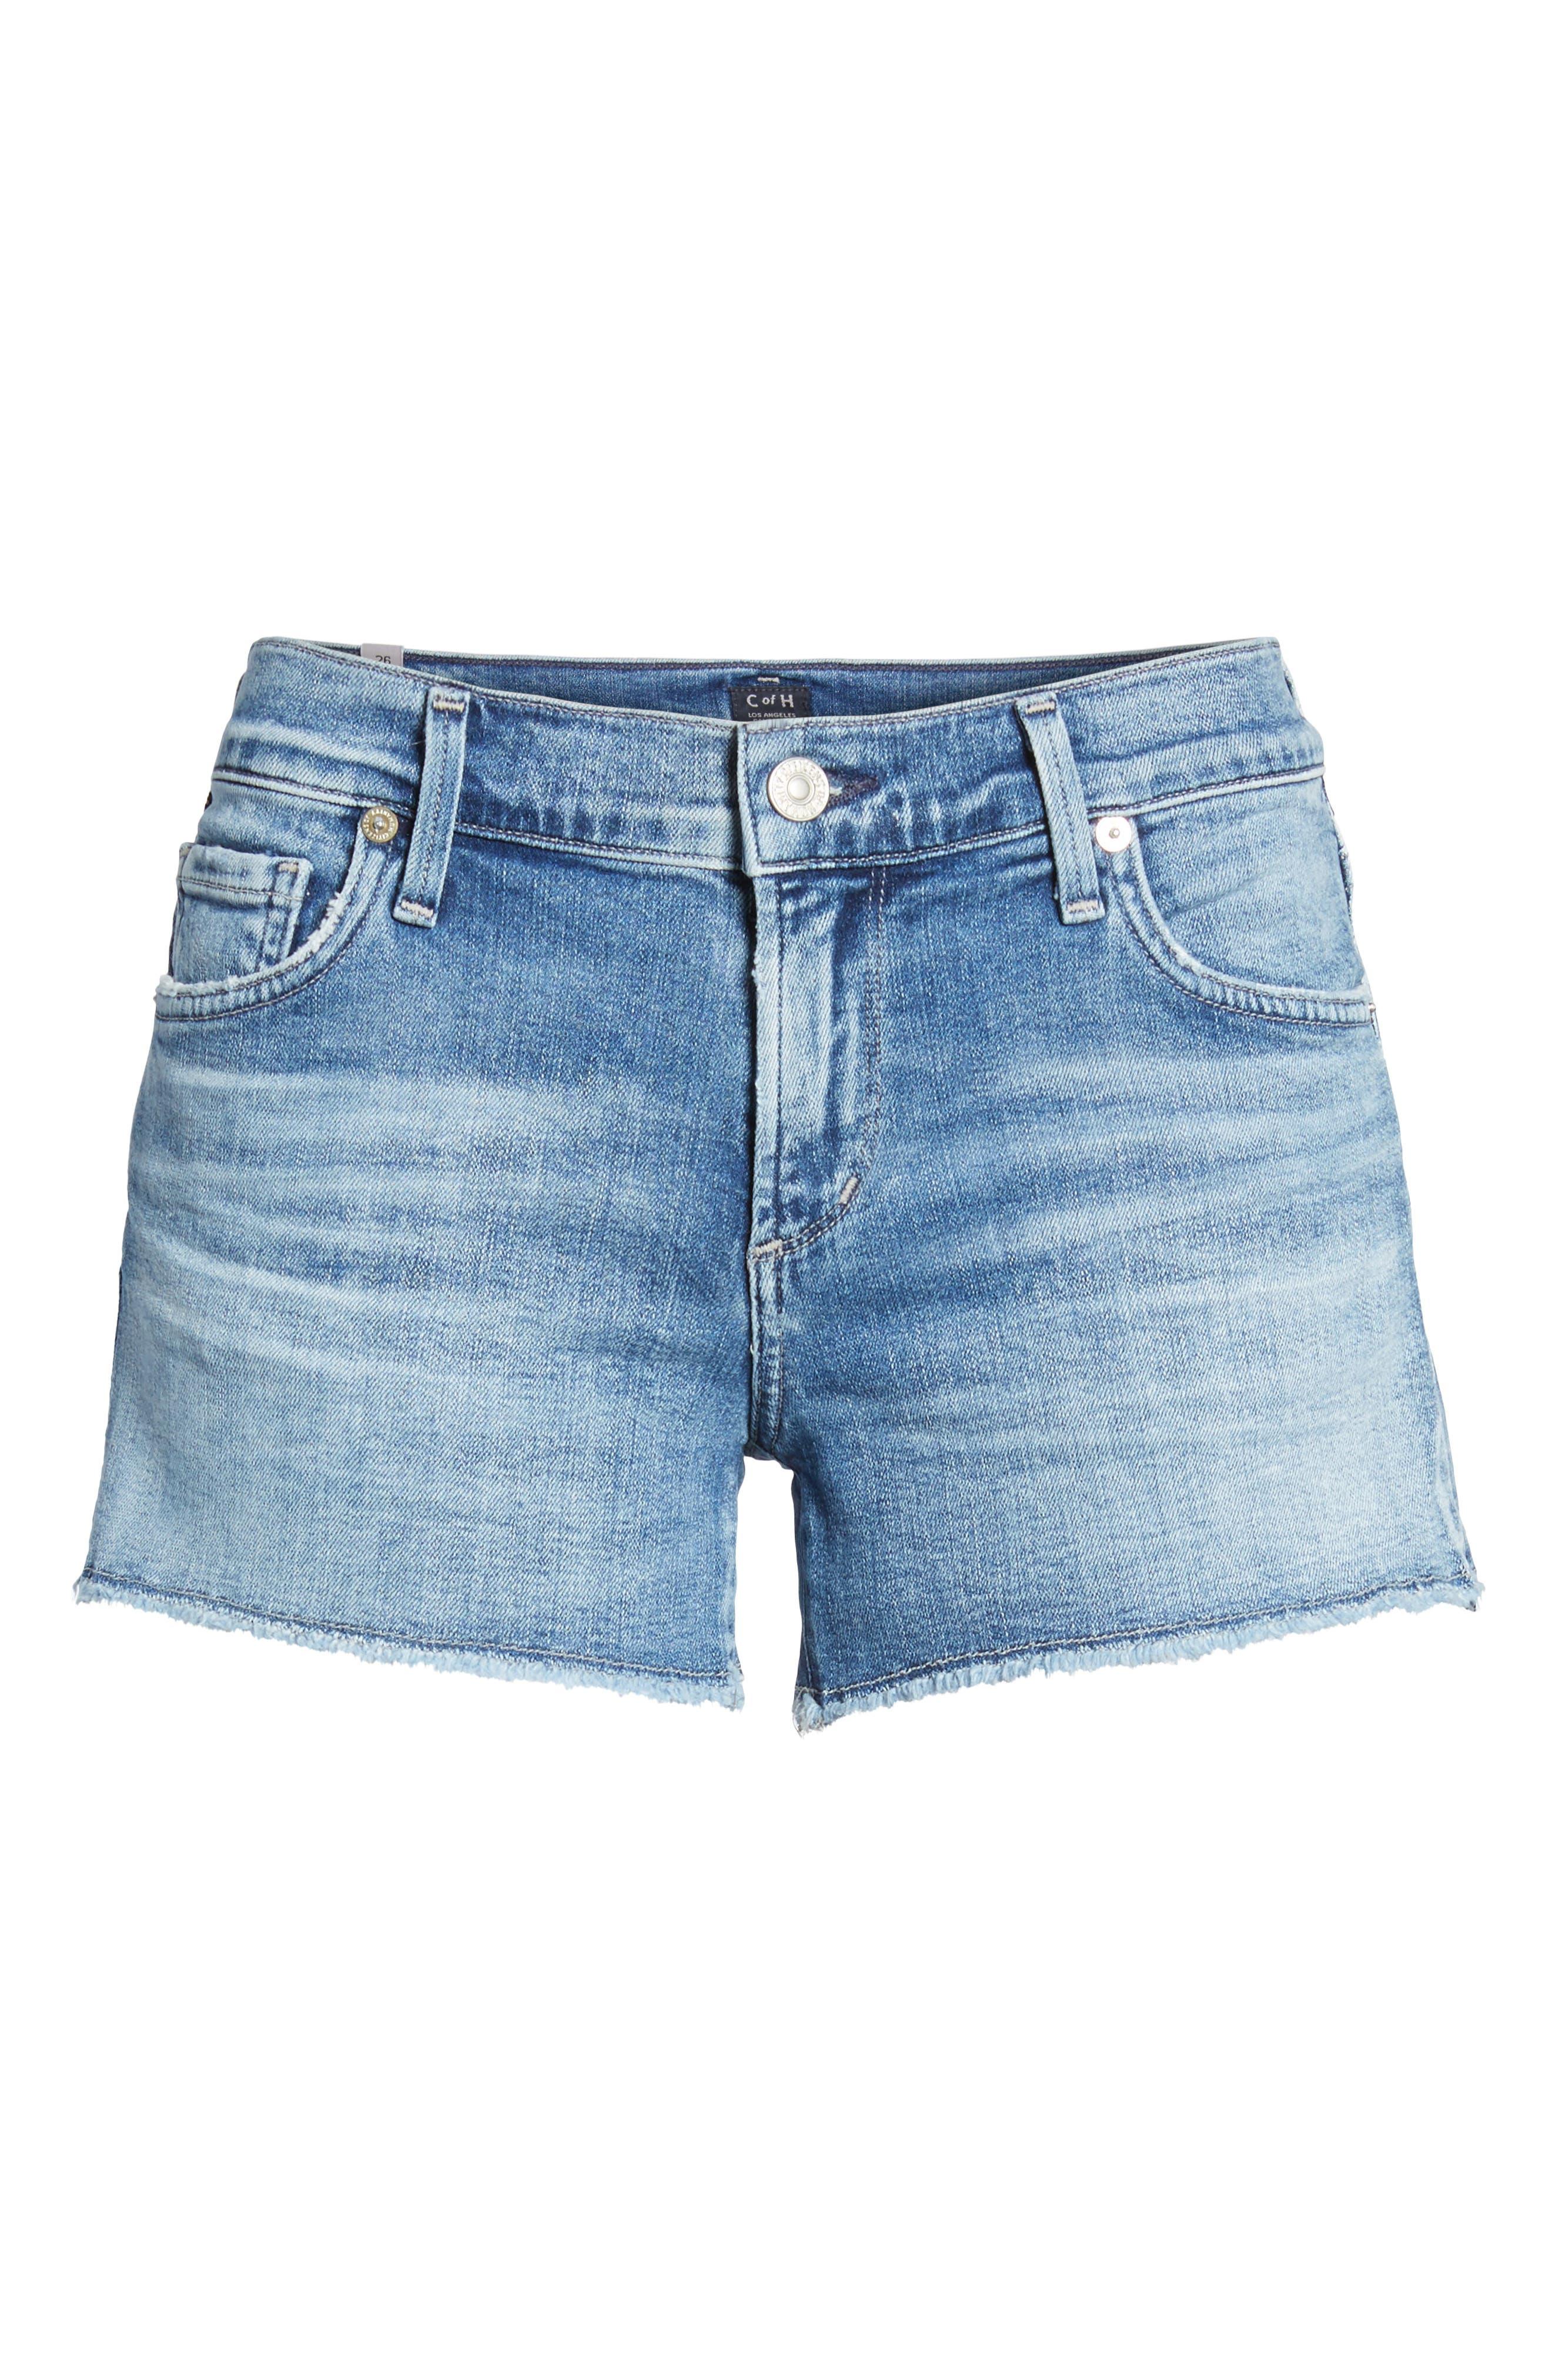 Ava Cutoff Denim Shorts,                             Alternate thumbnail 7, color,                             Pacifica